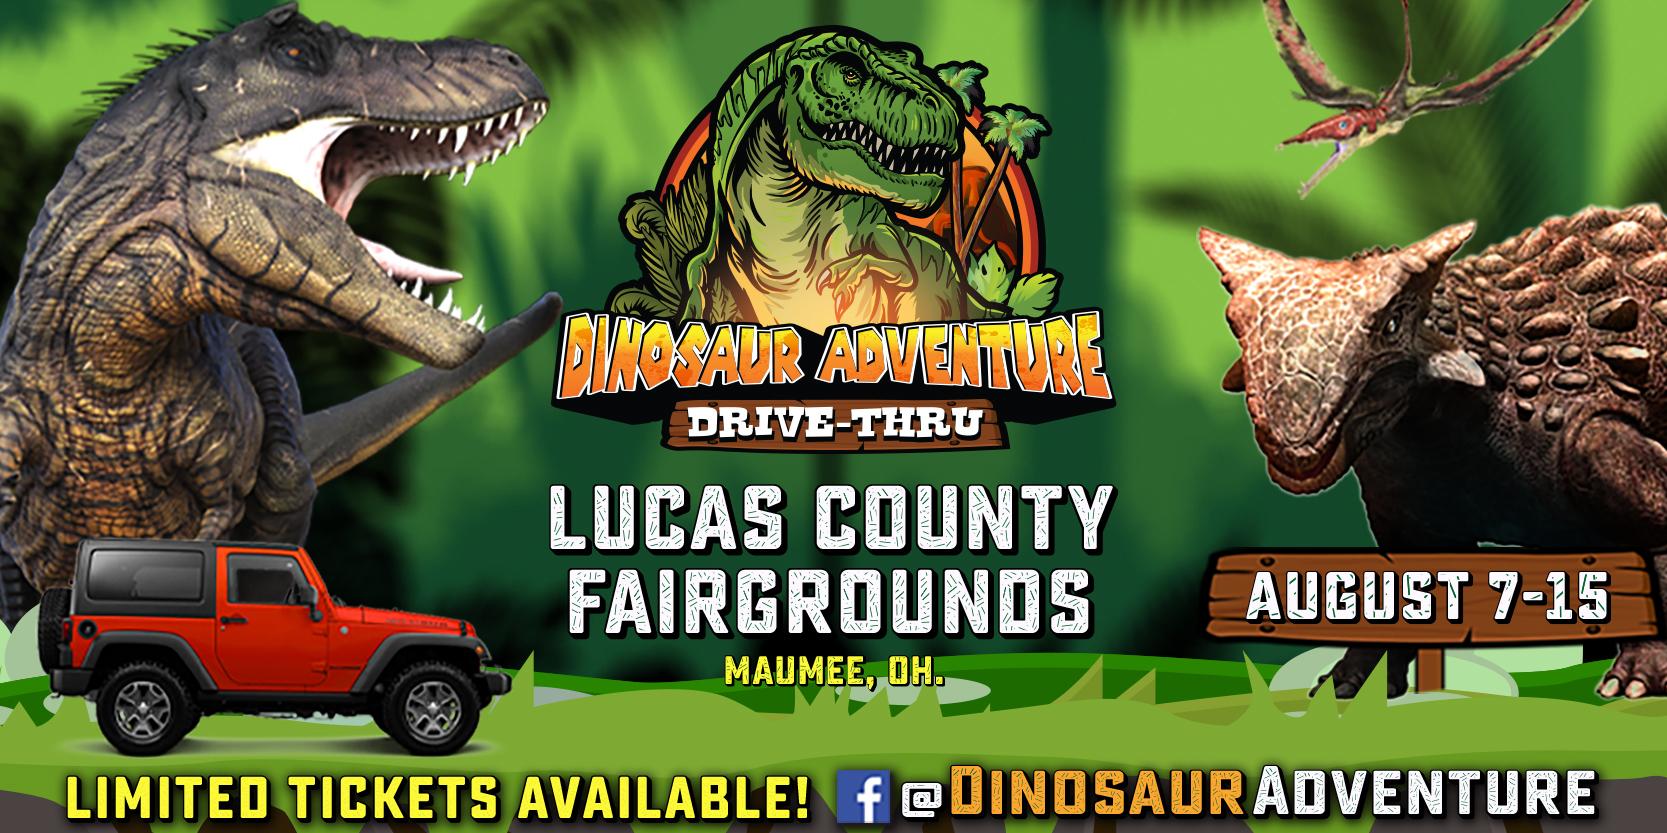 Dinosaur Adventure Drive Thru Toledo